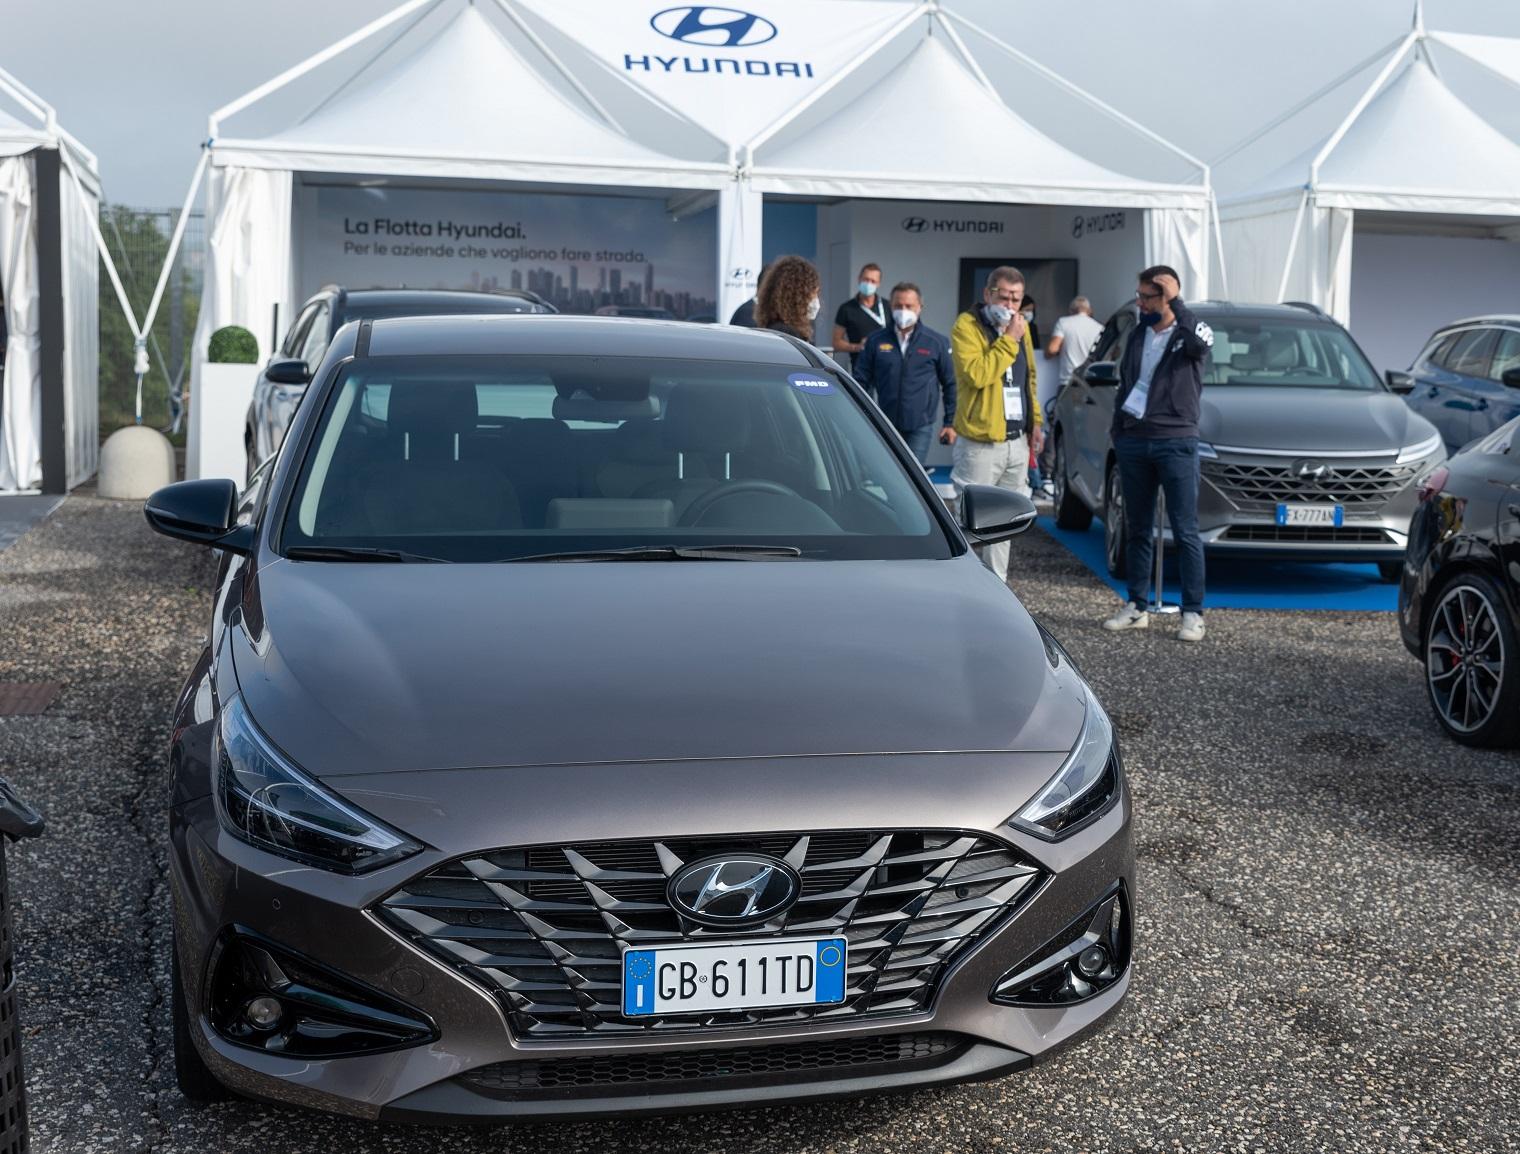 nuova Hyundai i30 Fleet Motor Day 2020